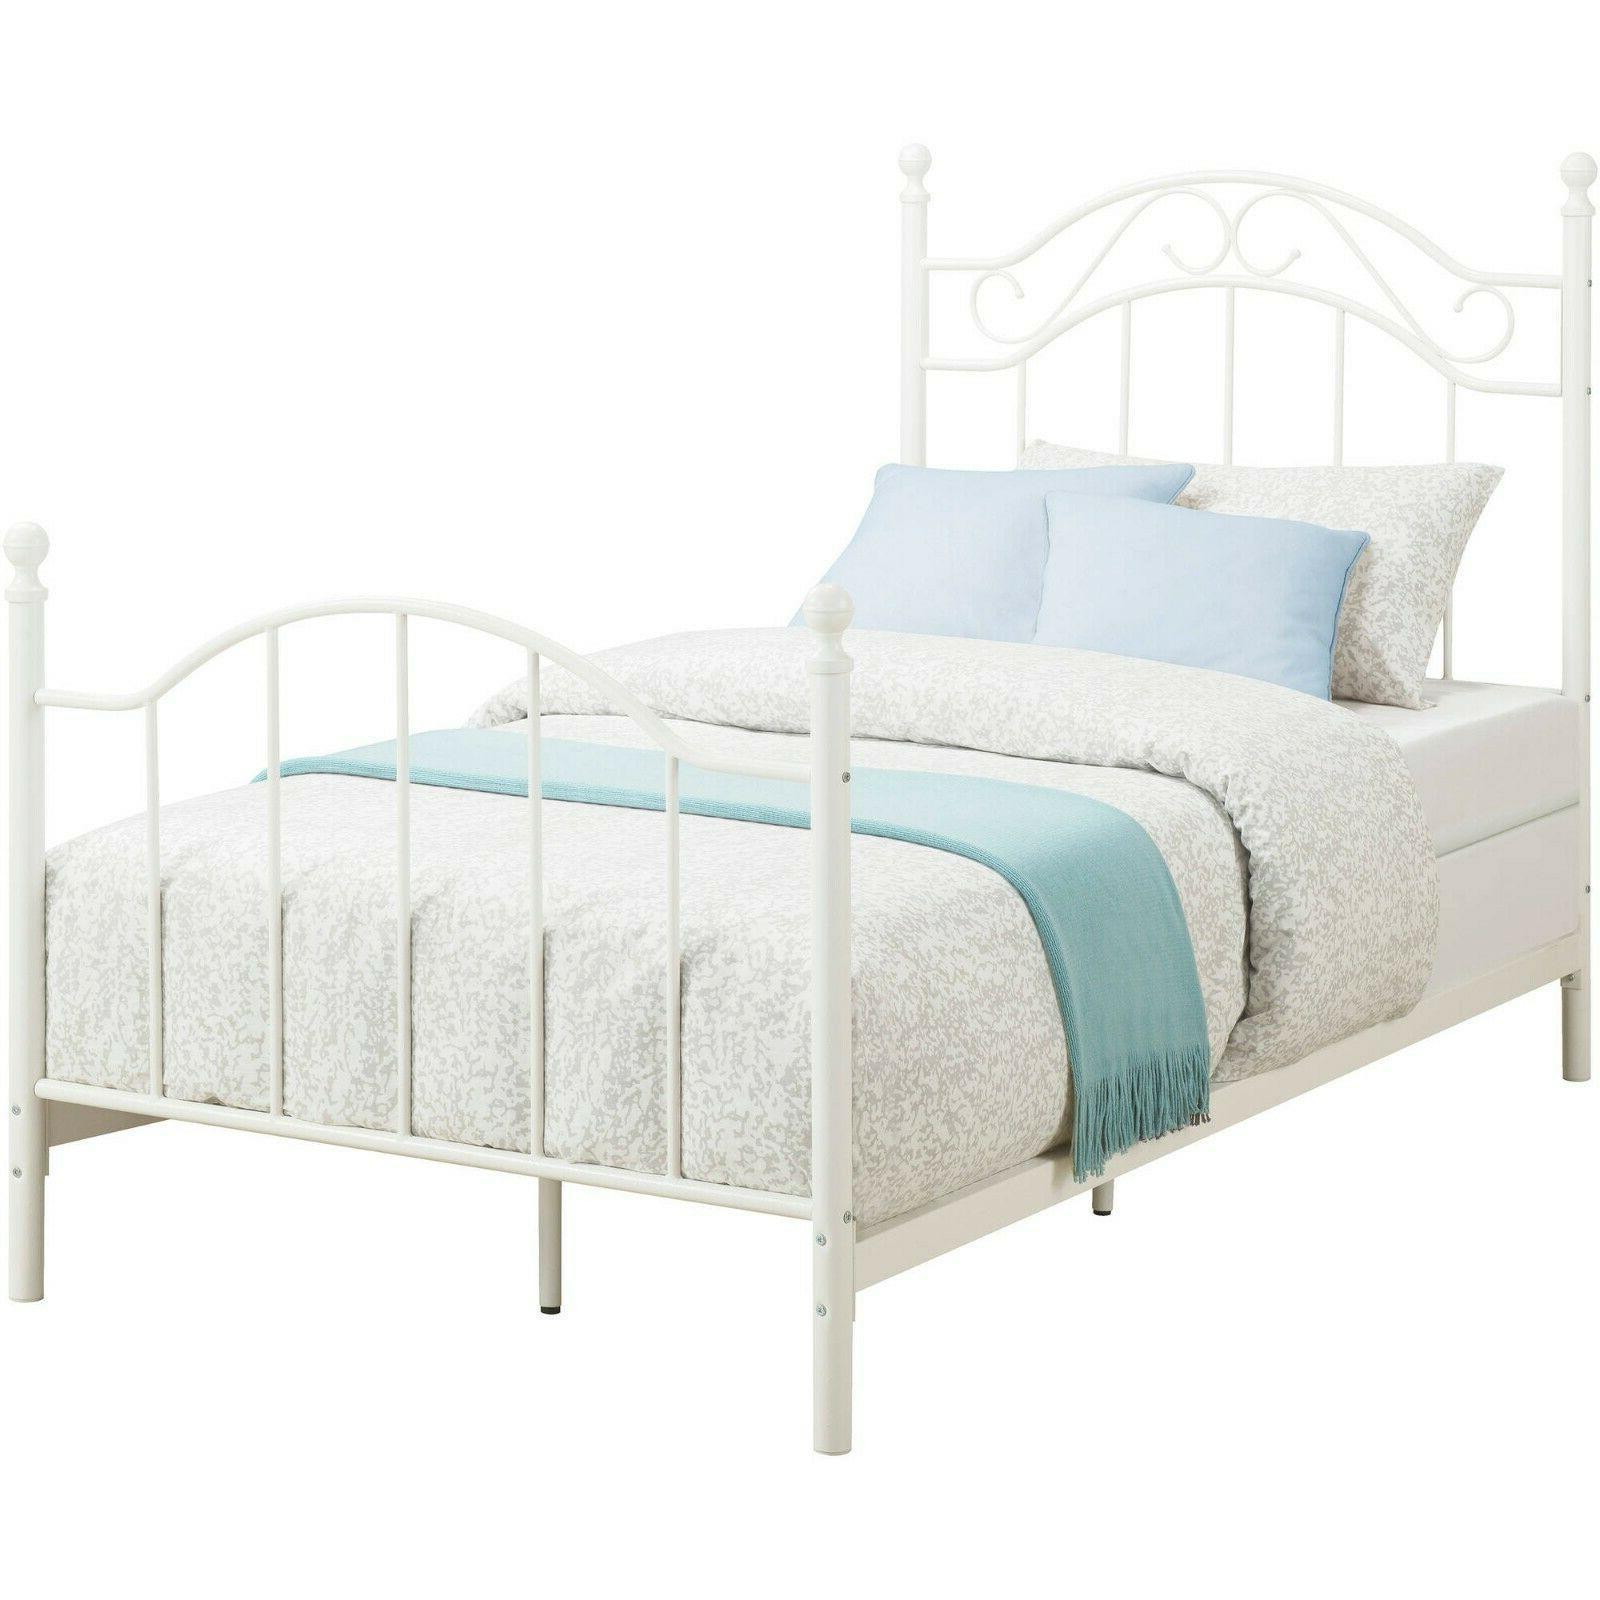 Girl Bed For Kids Bedroom Headboard Furniture